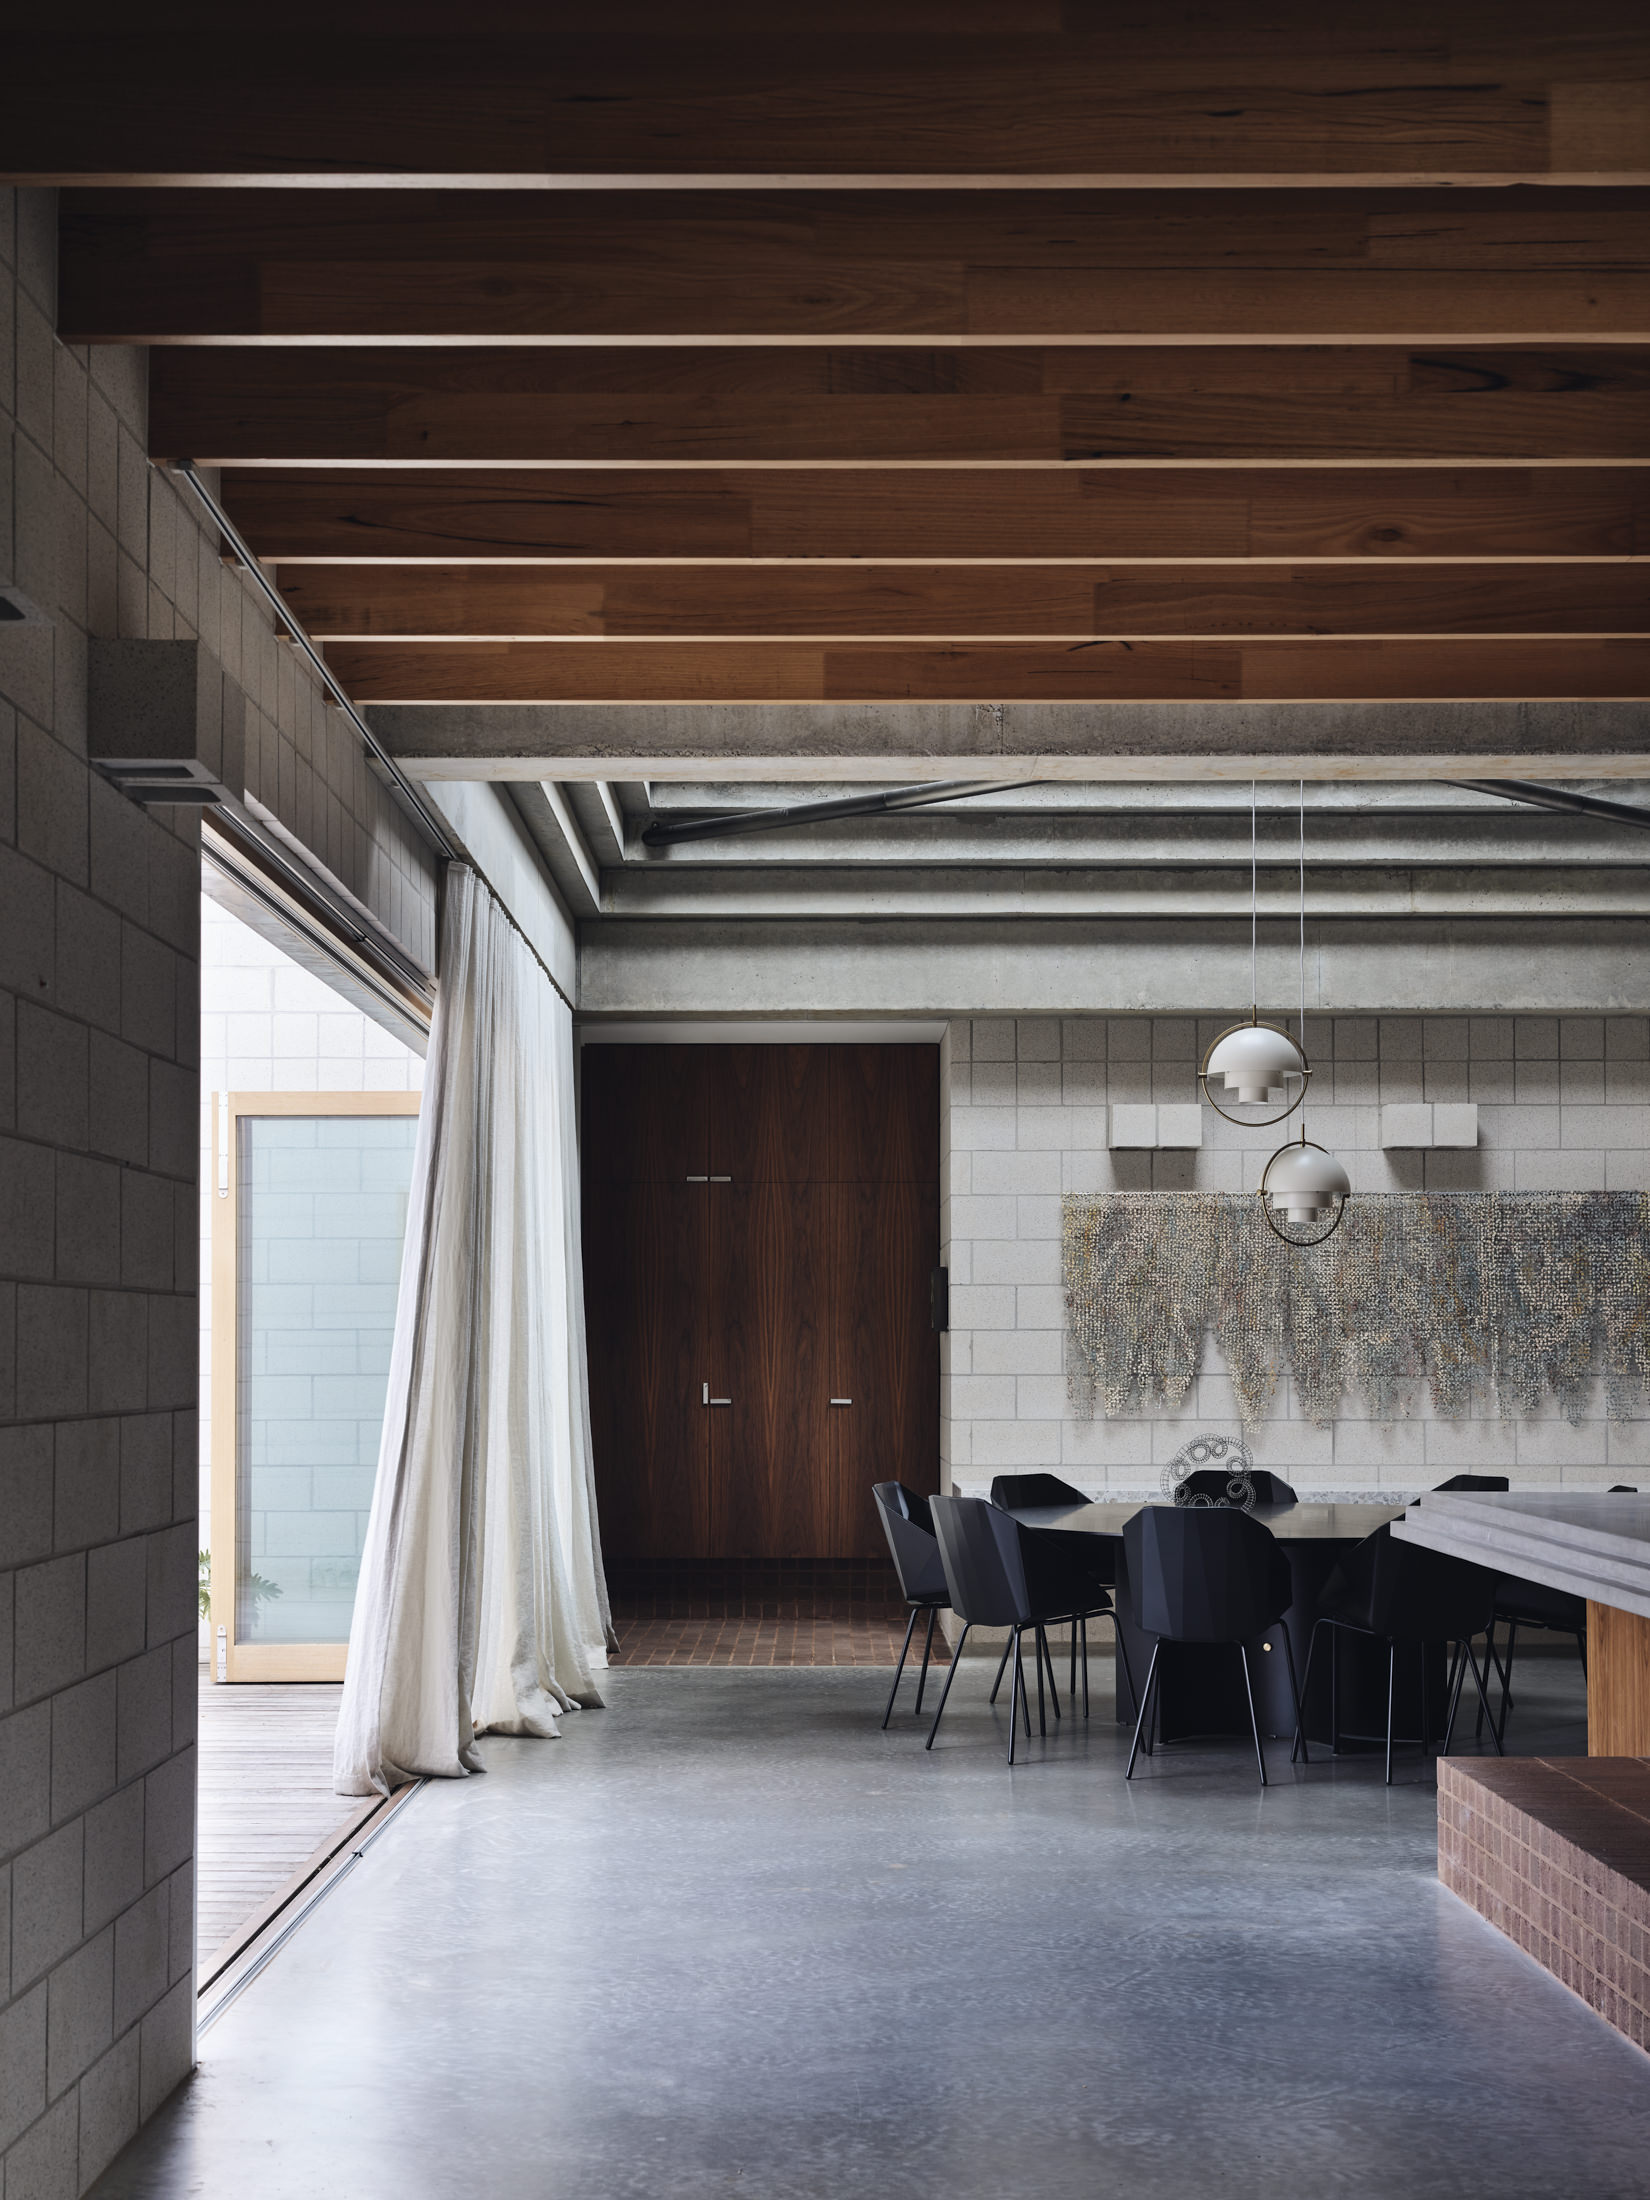 Architects Eat Bellows Beach House Flinders Masonry Architecture Photo Derek Swalwell Yellowtrace 24